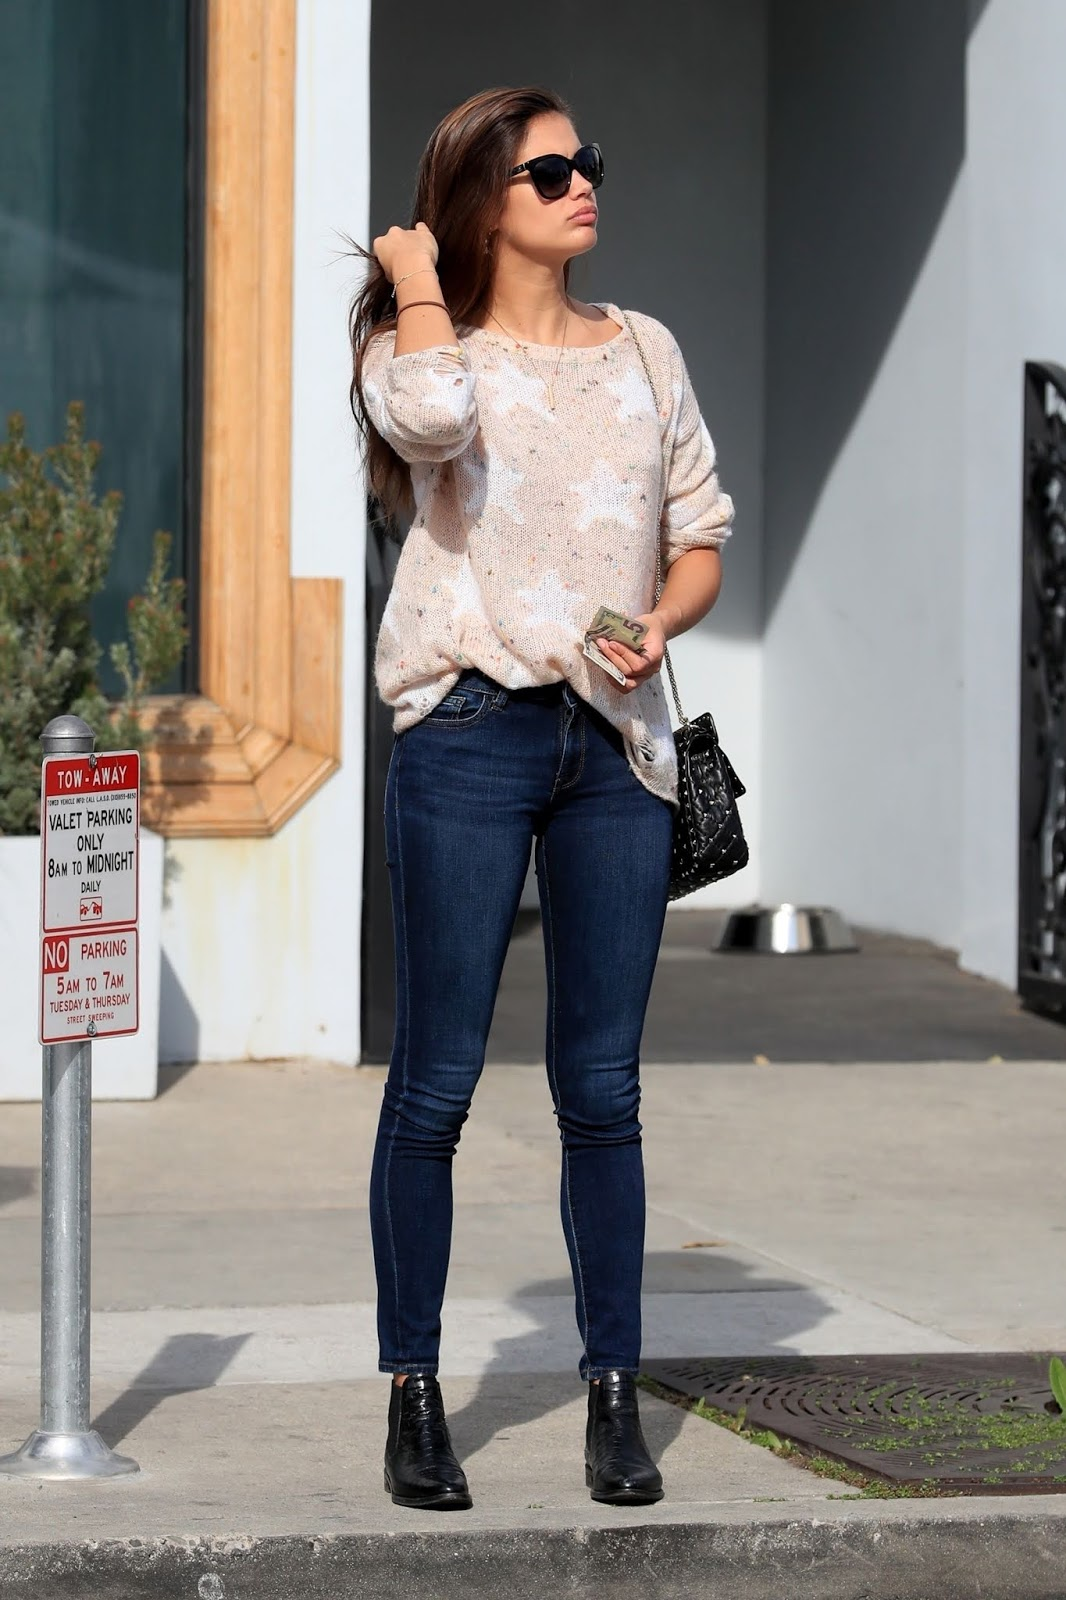 Sara Sampaio leaving Urth Caffé in West Hollywood - 01/29/2019